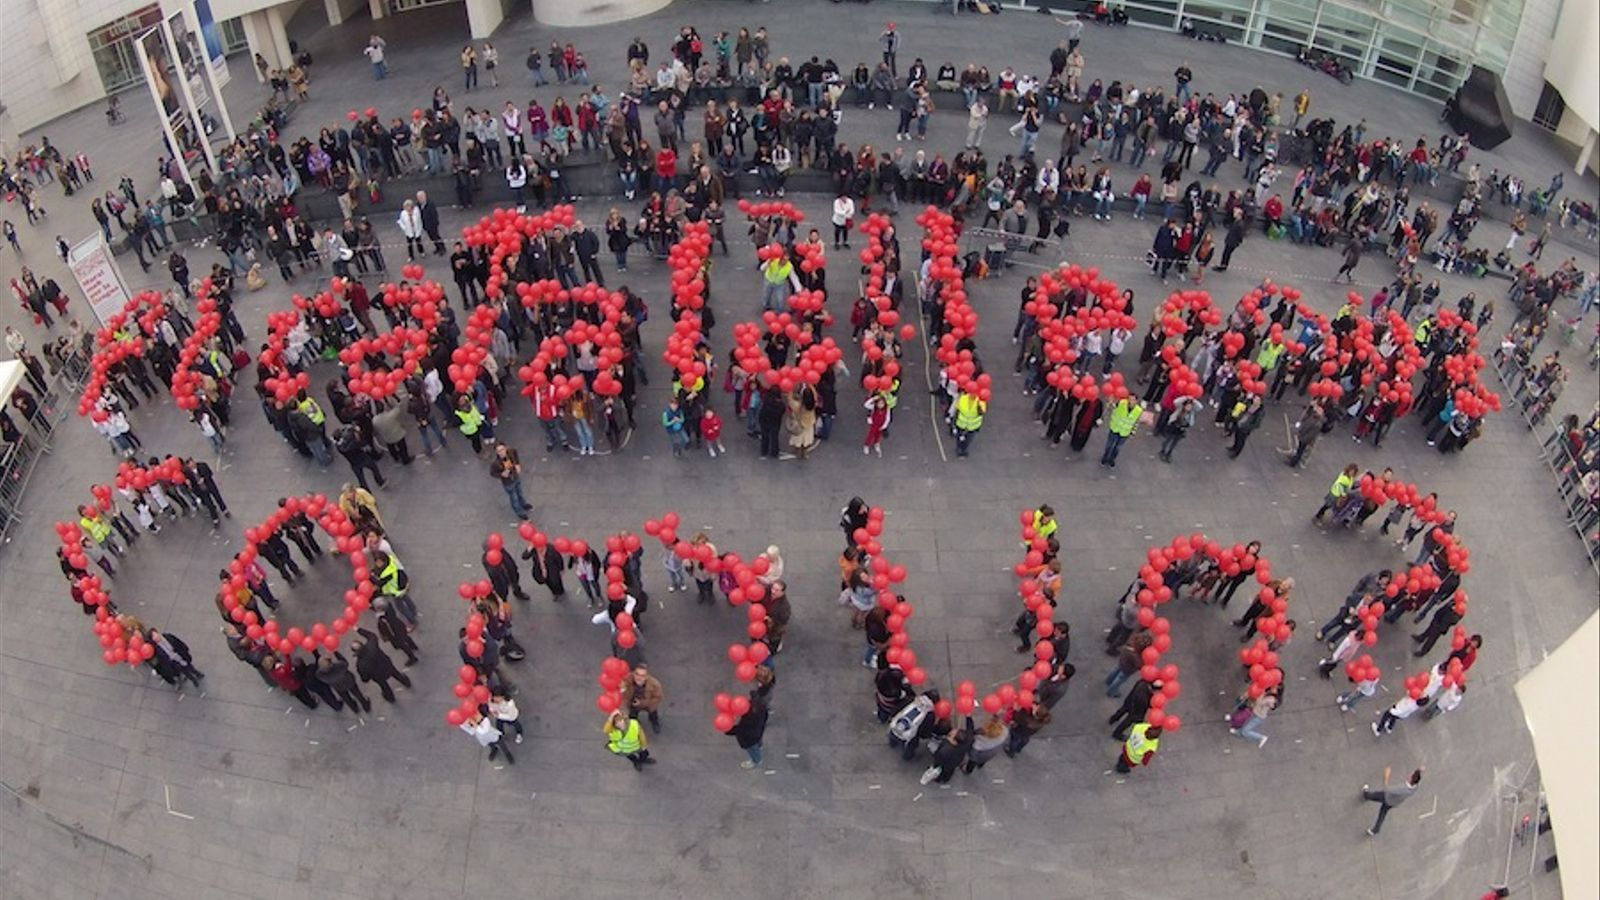 Centenars de persones enlairen globus en defensa del català al centre de Barcelona